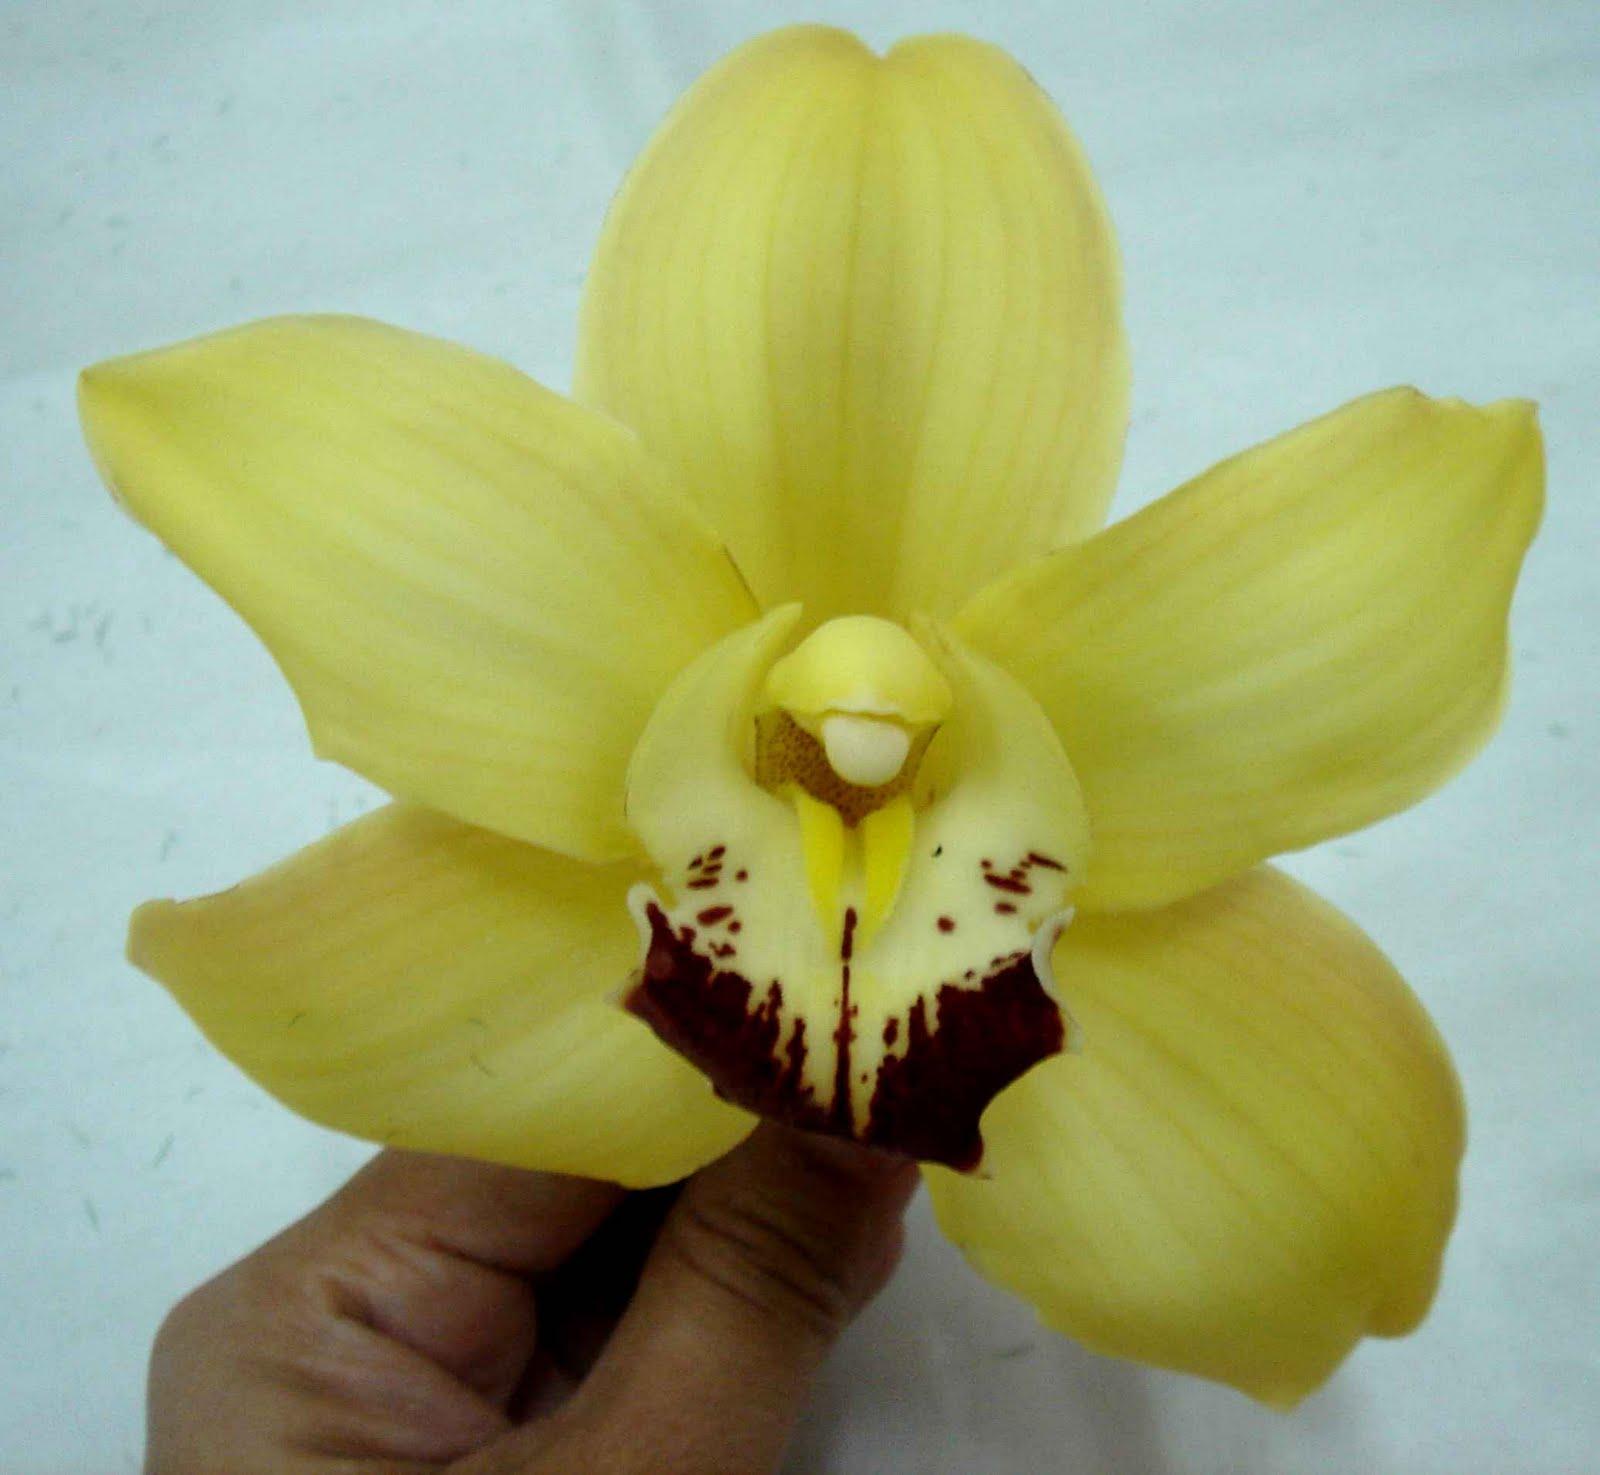 http://4.bp.blogspot.com/-pYacYukgcWY/Tf9_CYJmJrI/AAAAAAAAAVI/ygjSM1ugwNk/s1600/Cymbidium+Orchids+Flowers+Wallpapers+2.jpg